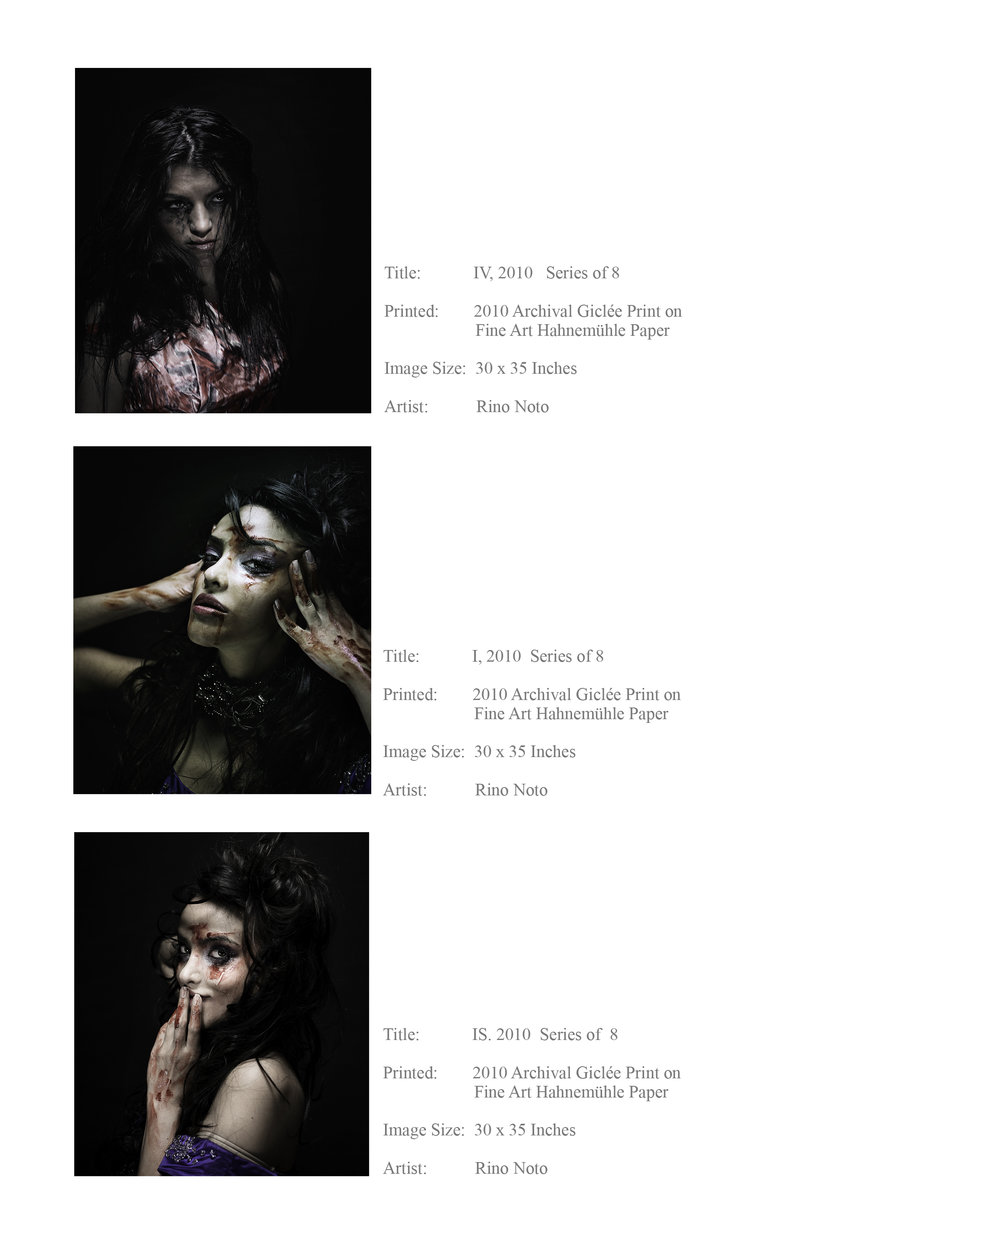 Spazio-page5.jpg